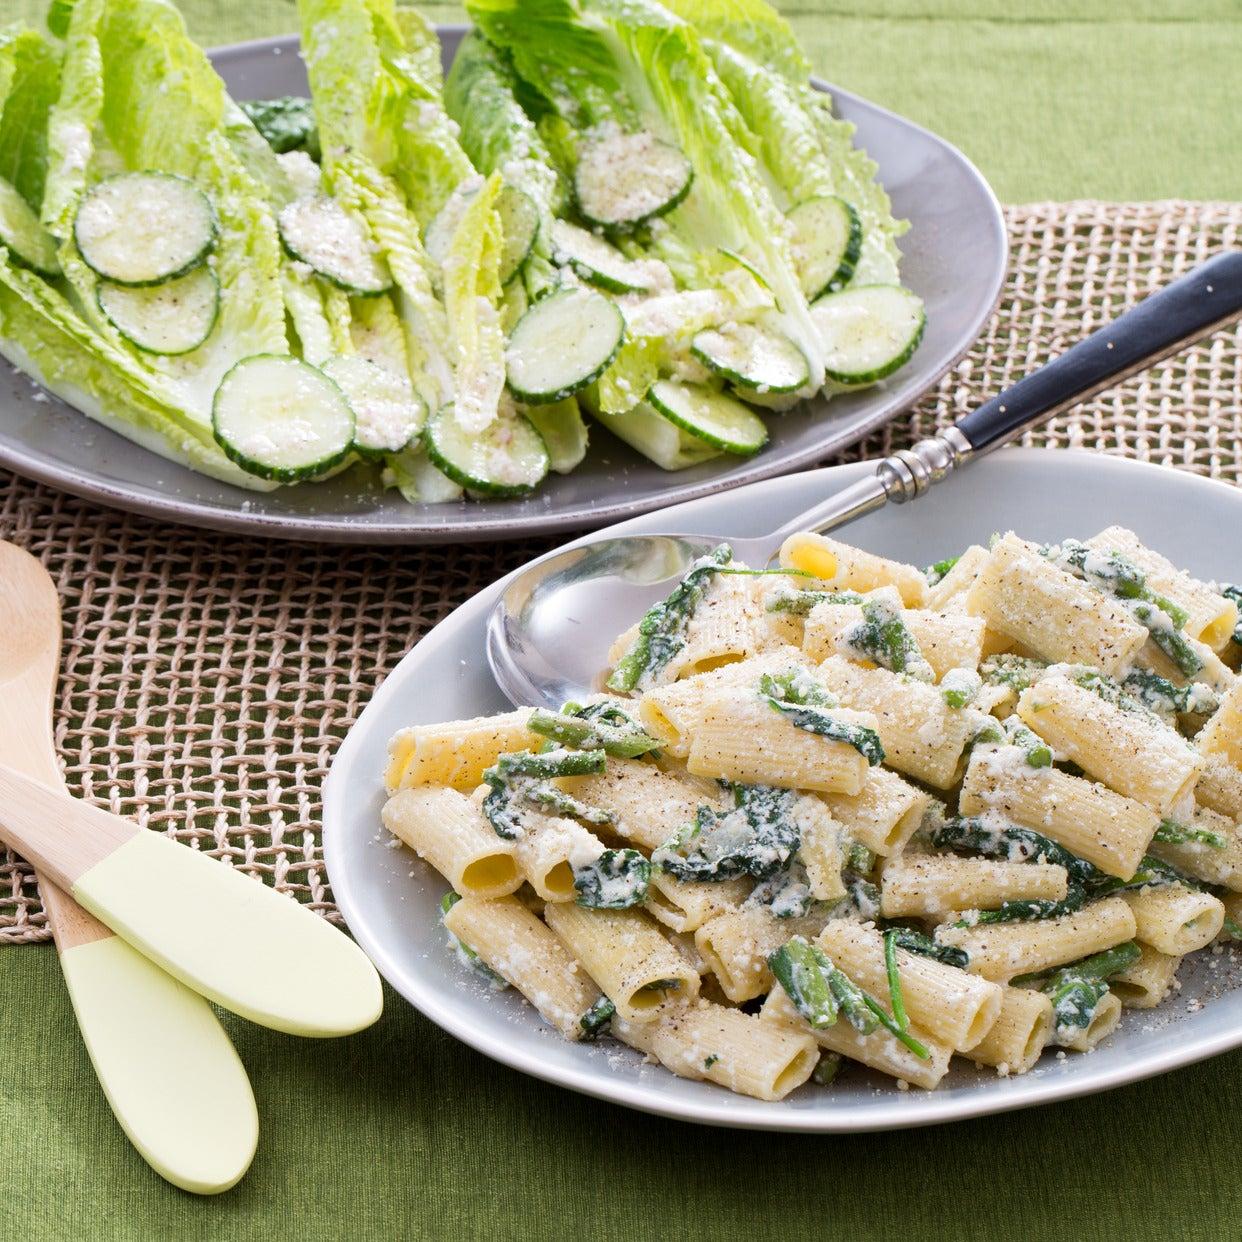 Recipe: Creamy Asparagus Rigatoni With Romaine Salad